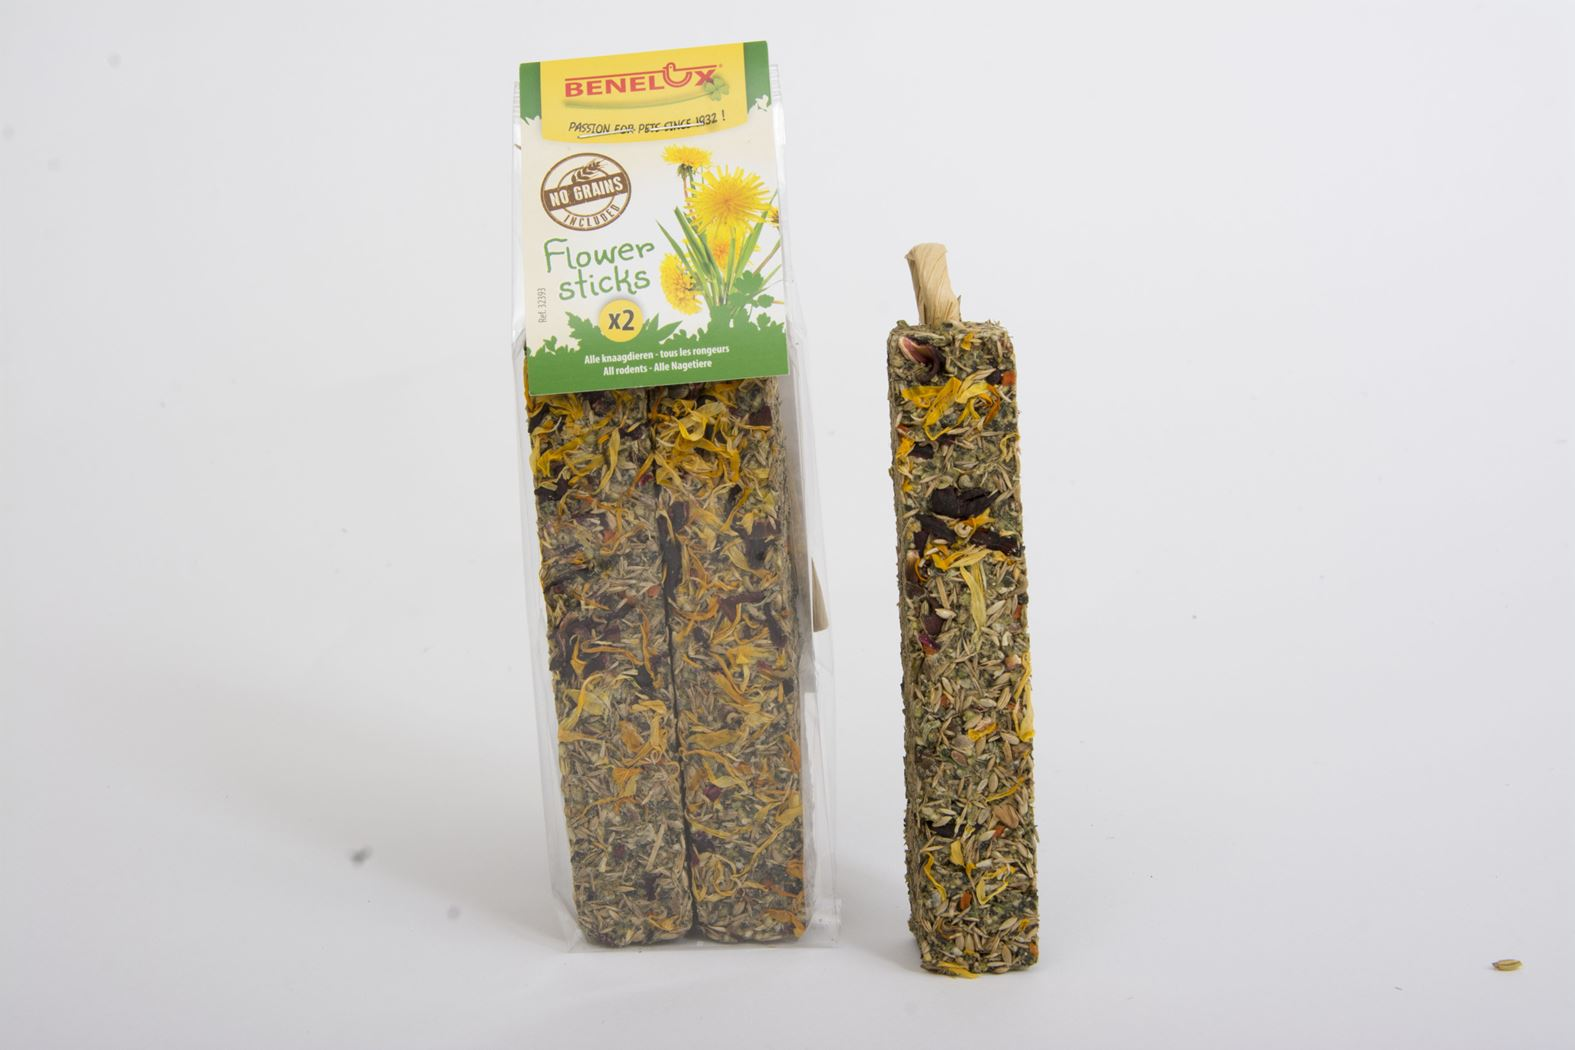 benelux sticks flower grain free (2sts)